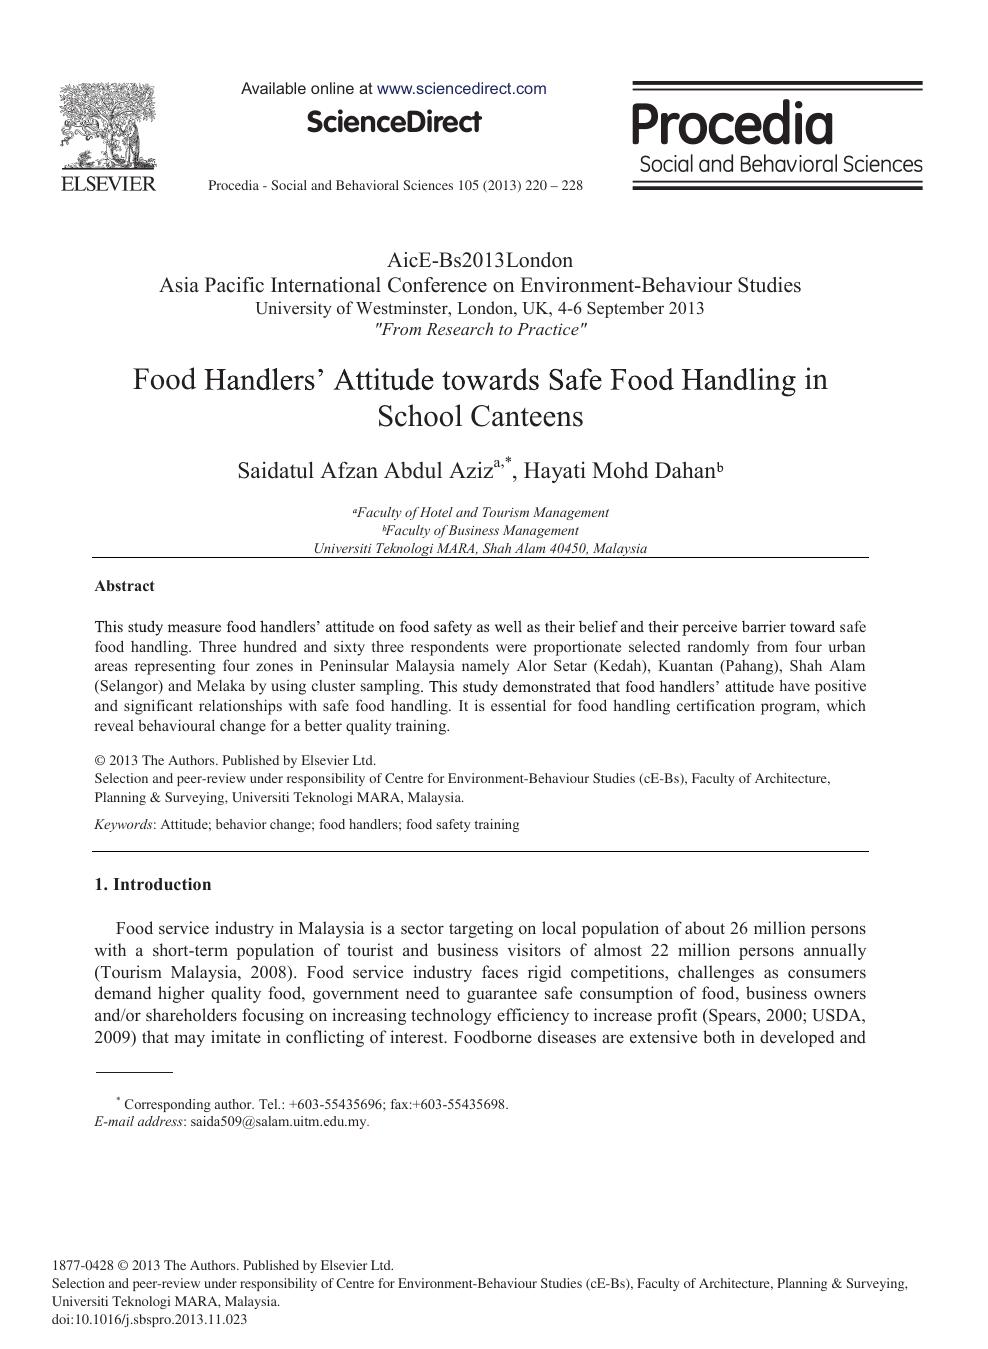 Food Handlers' Attitude towards Safe Food Handling in School